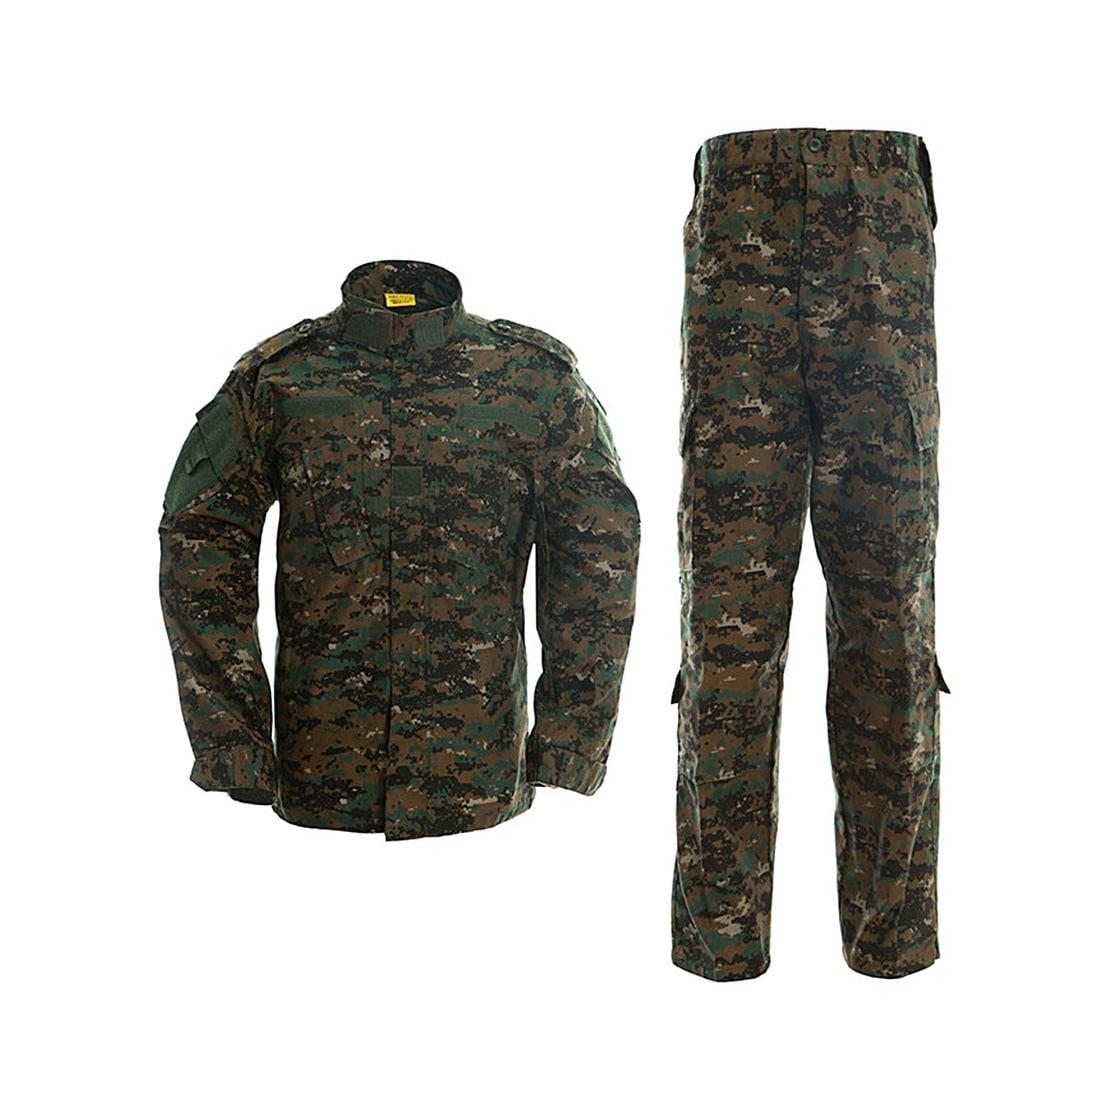 acu uniform second verion 10.jpg